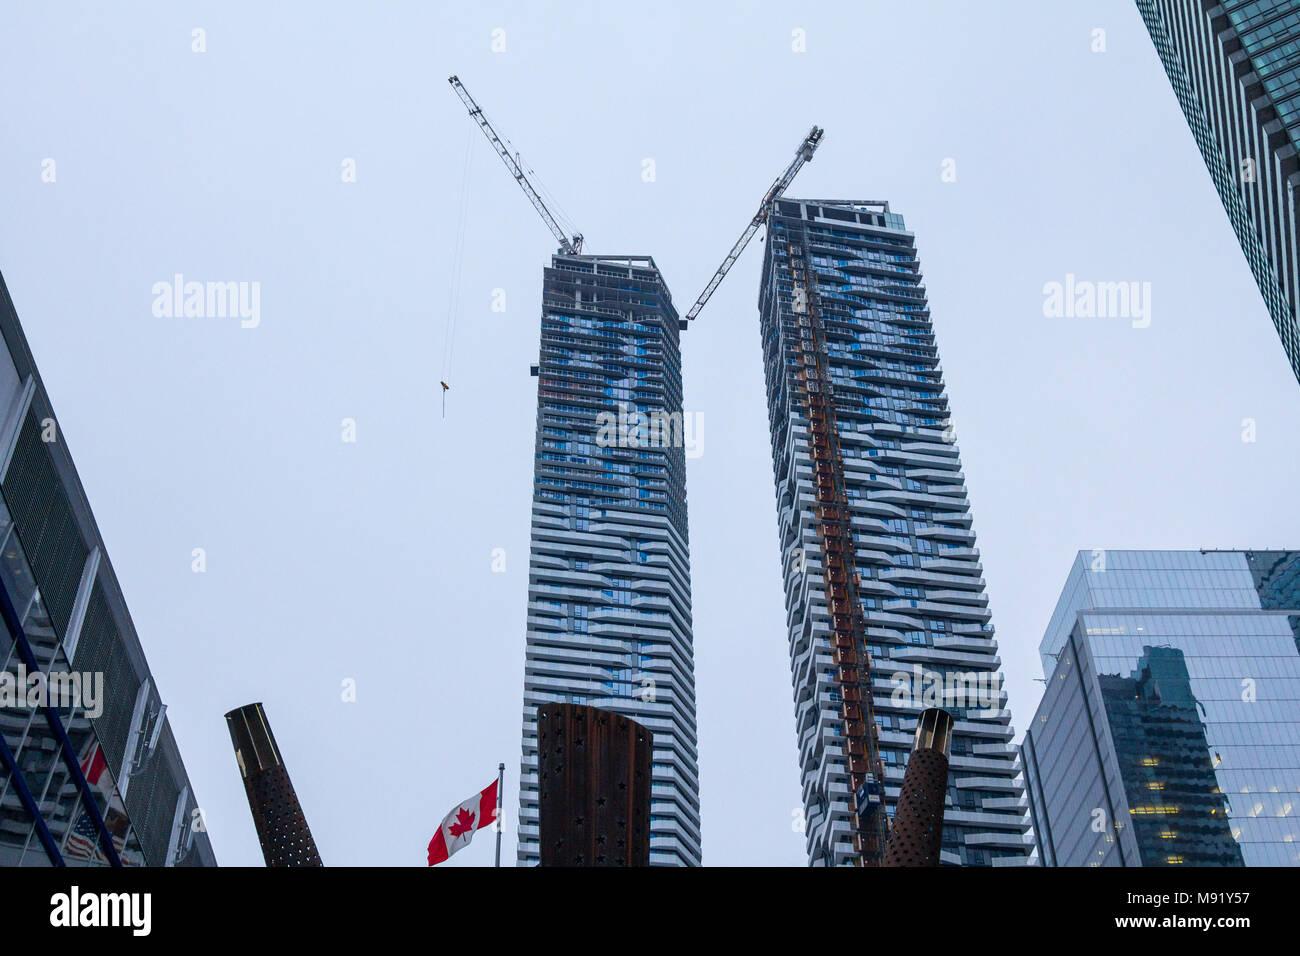 TORONTO, CANADA - DECEMBER 21, 2016: Condo Skyscraper construction site in front of older buildings in downtown Toronto, Ontario, Canada  Picture of C - Stock Image